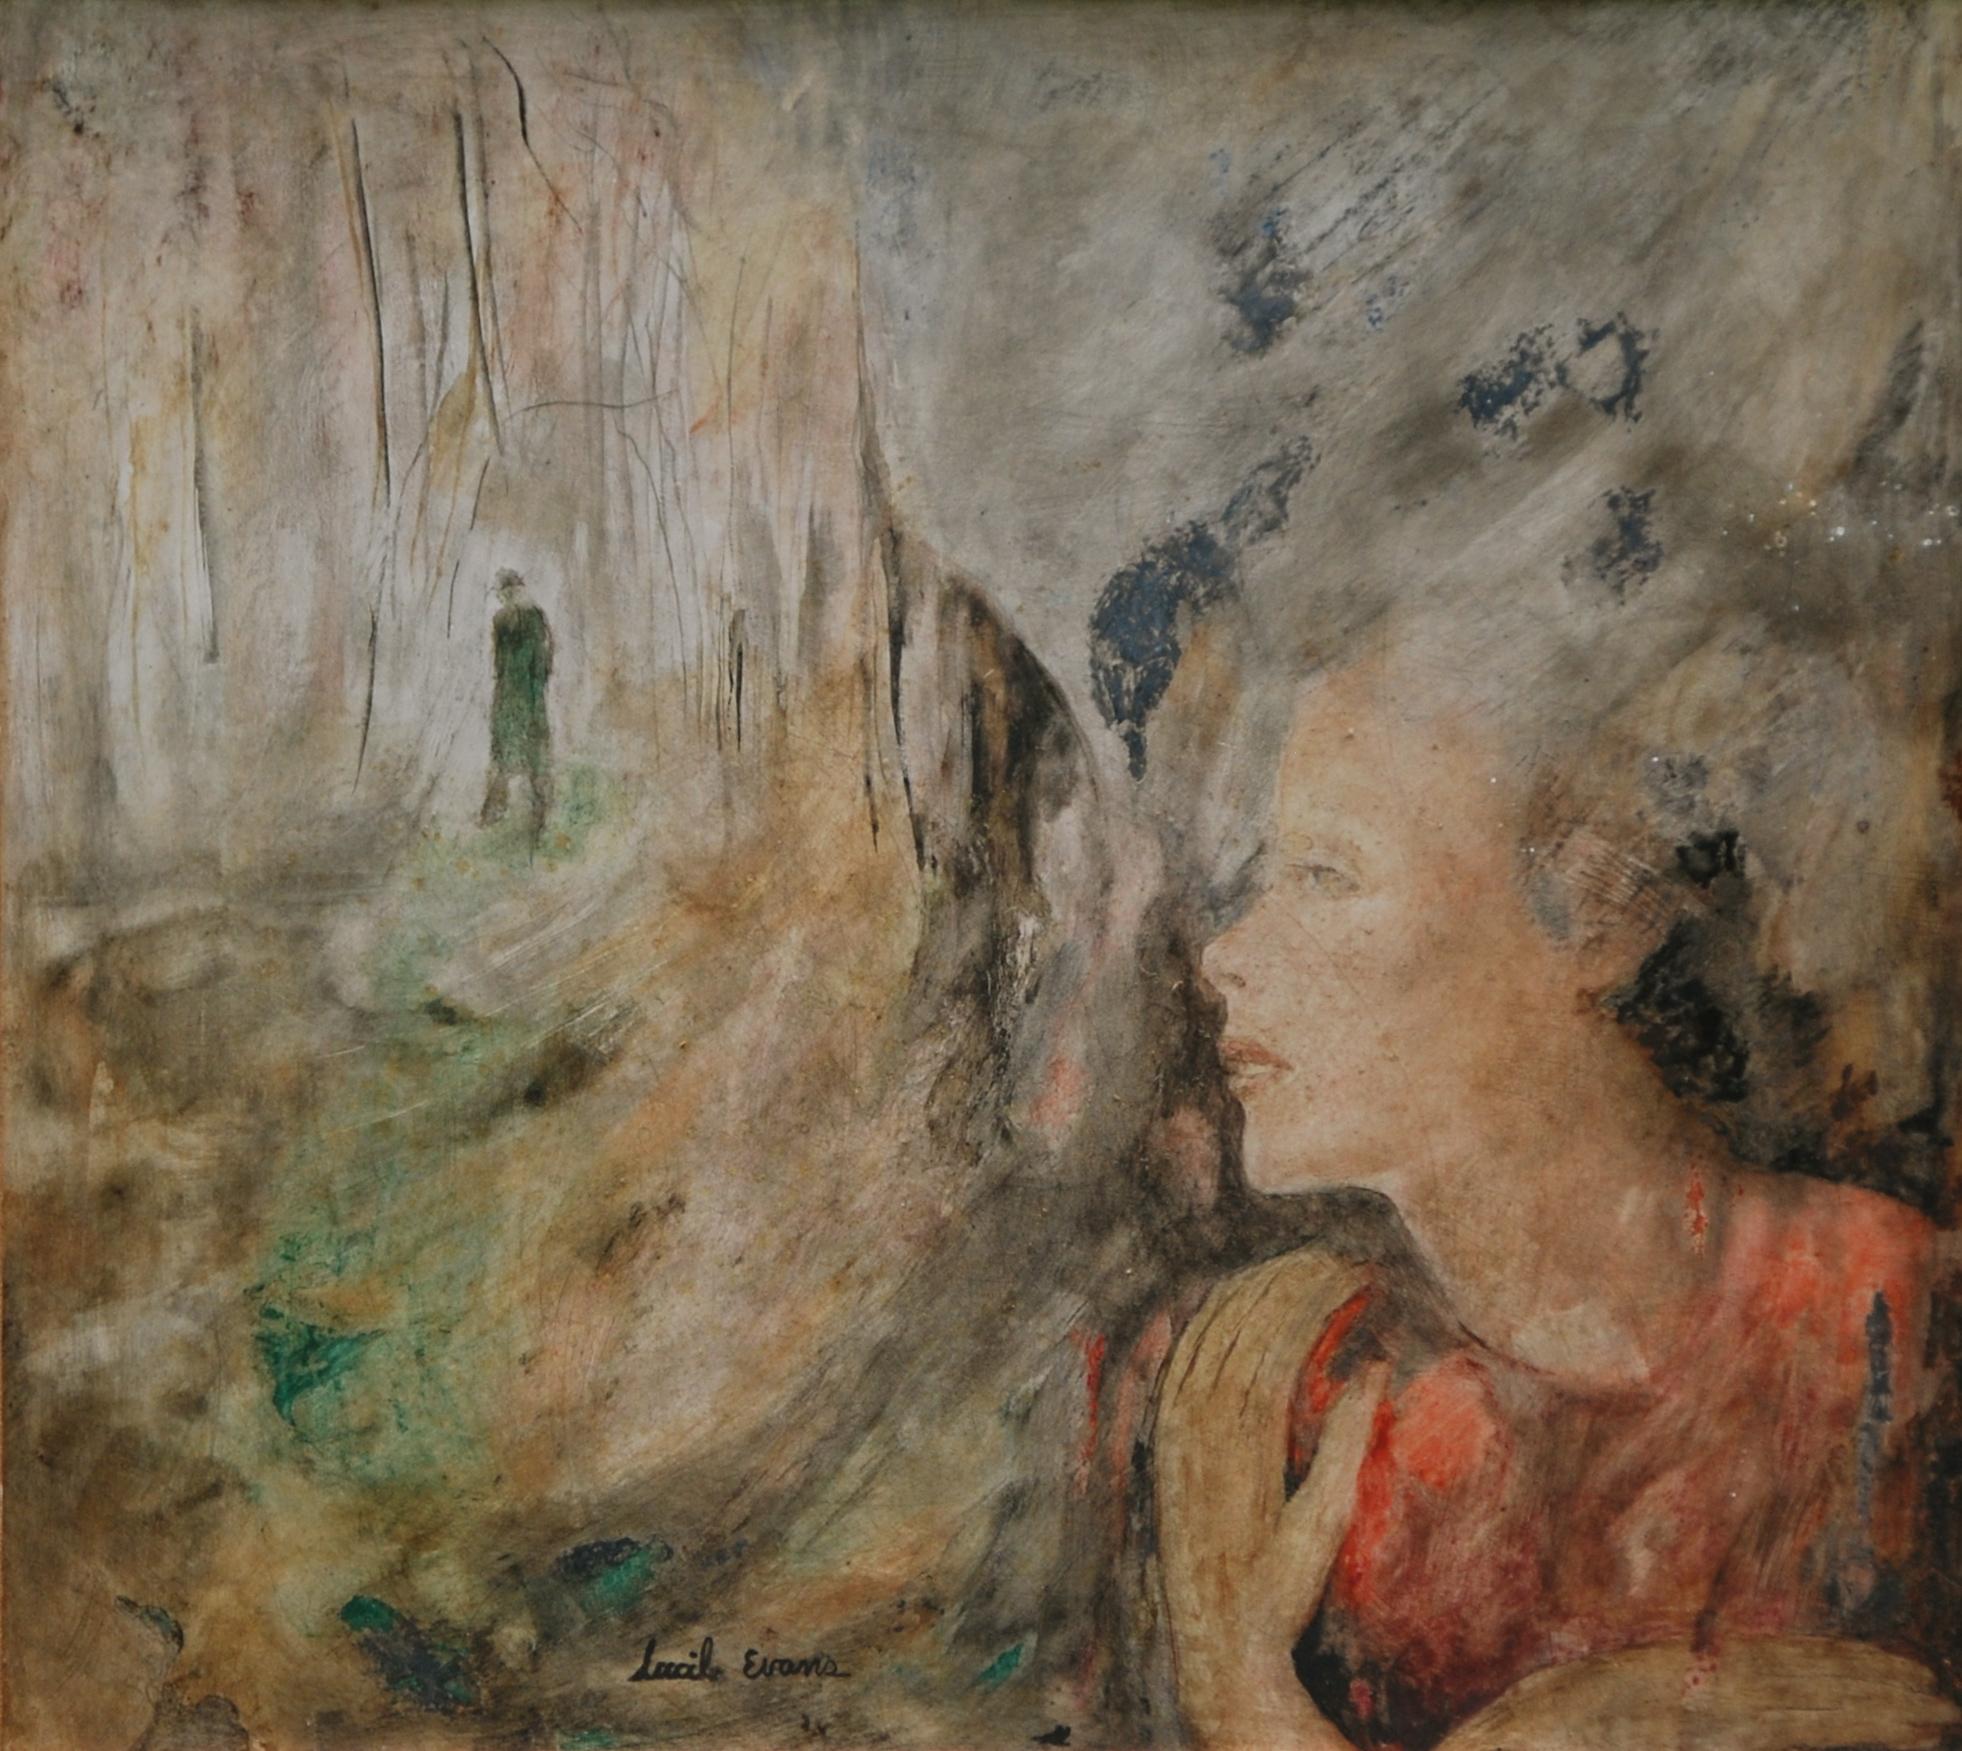 Dream in a Forest (Self-Portrait),1943,waxencaustic of board,17.5x19_.jpg